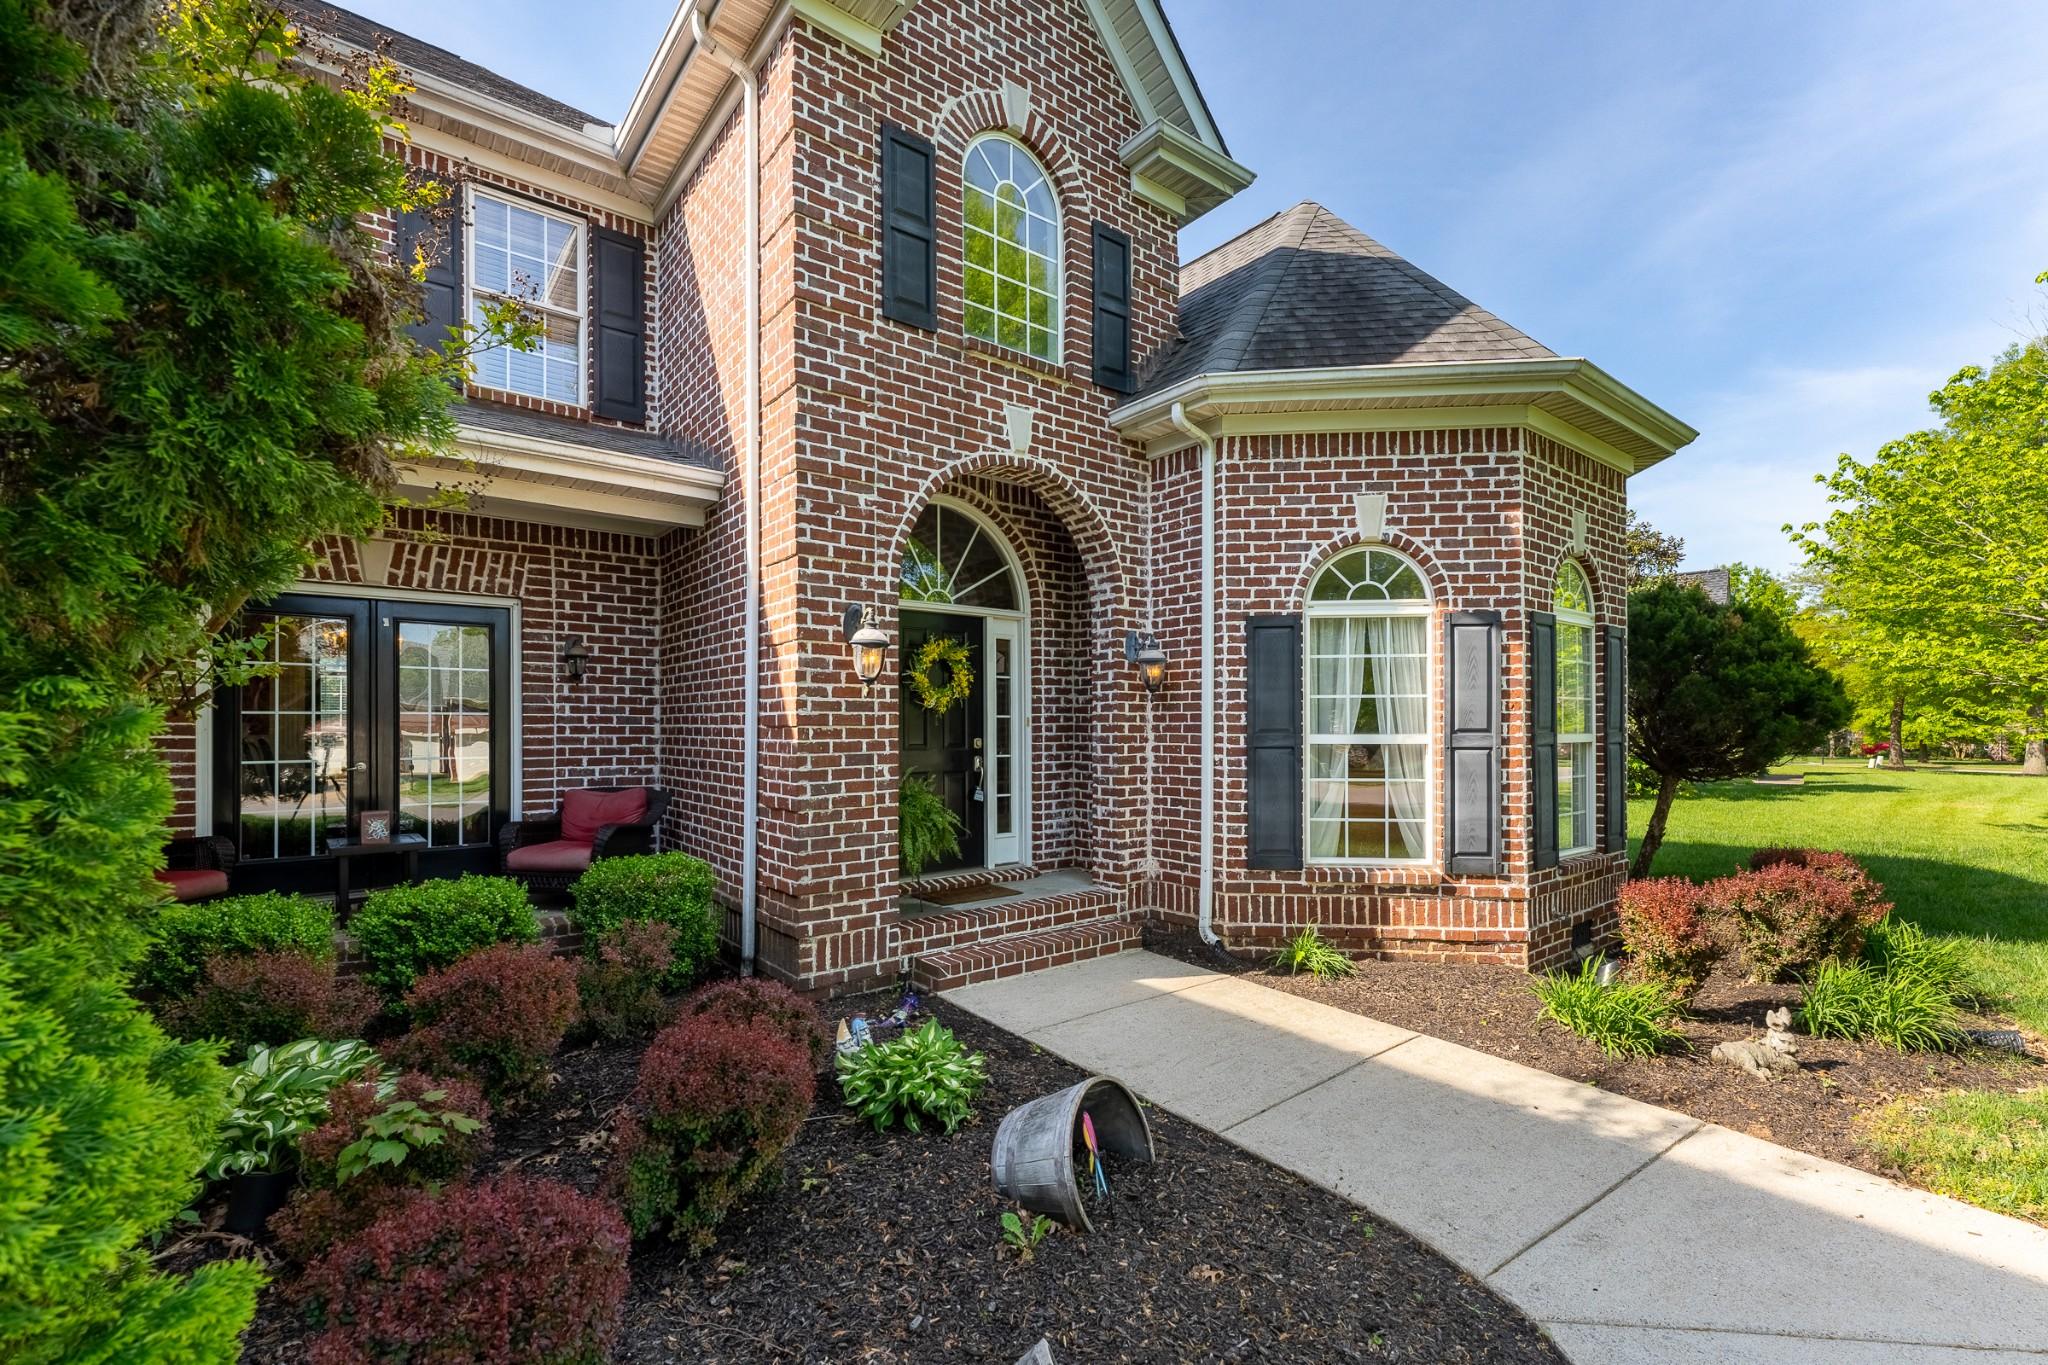 5453 Cavendish Dr Property Photo - Murfreesboro, TN real estate listing